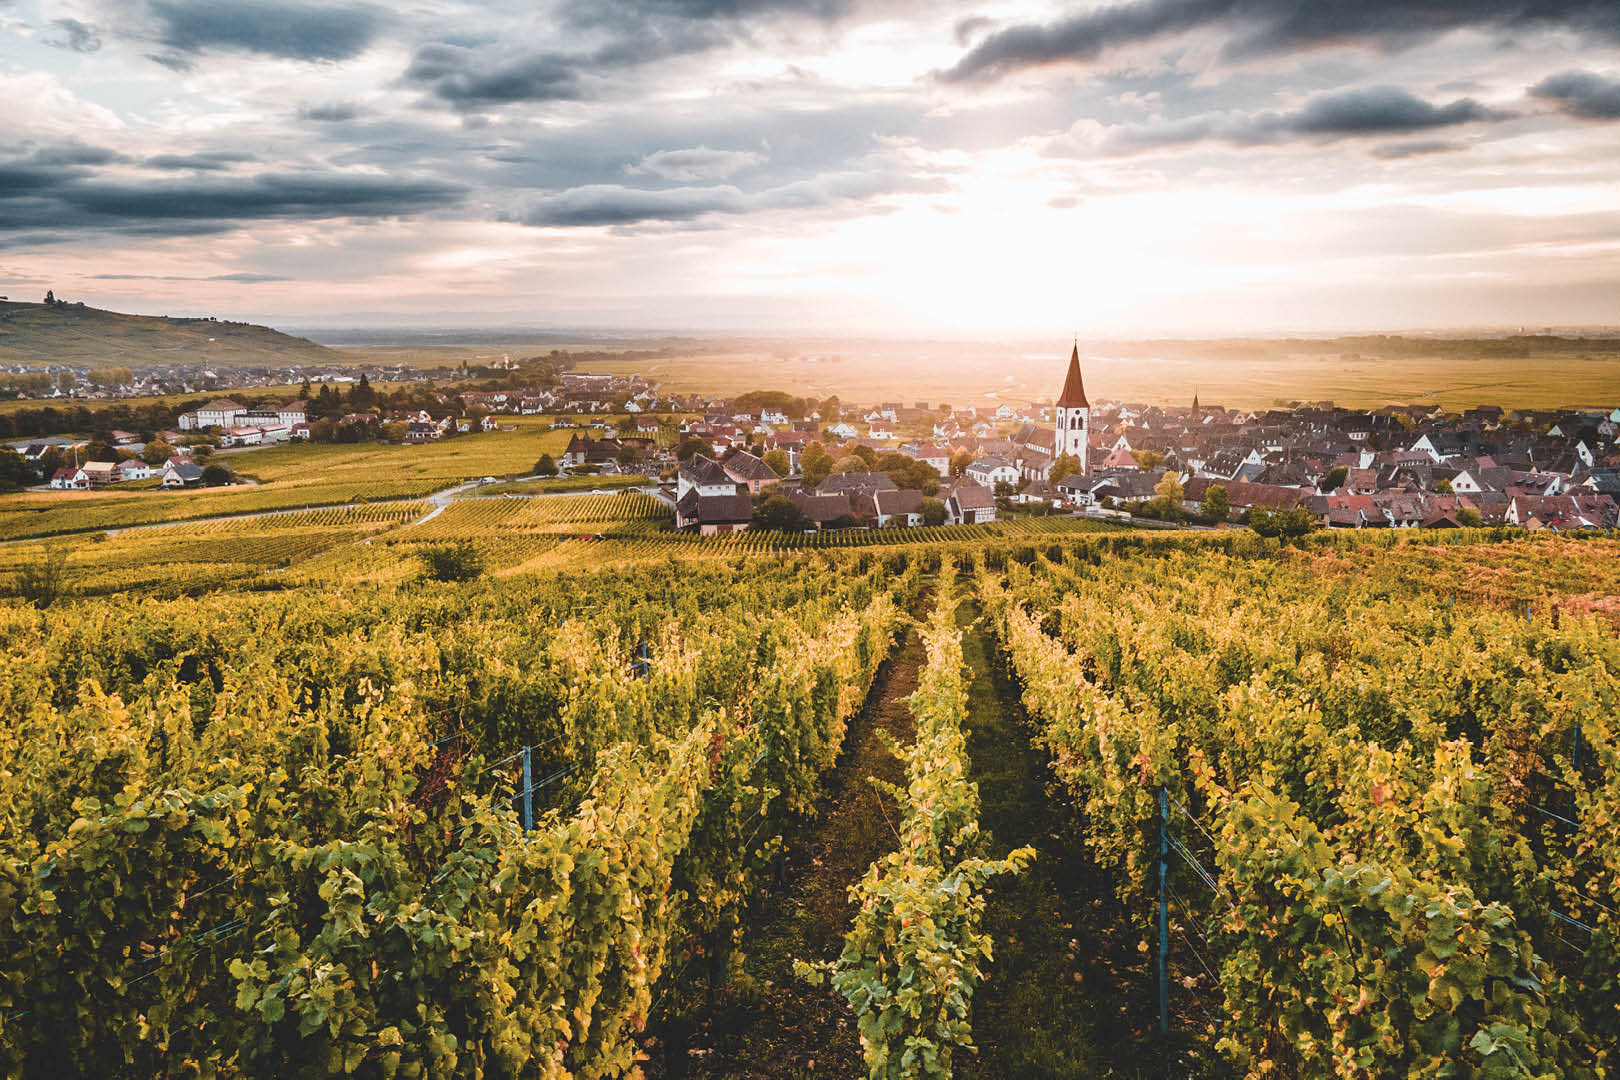 Le village alsacien d'Ammerschwihr au lever du soleil